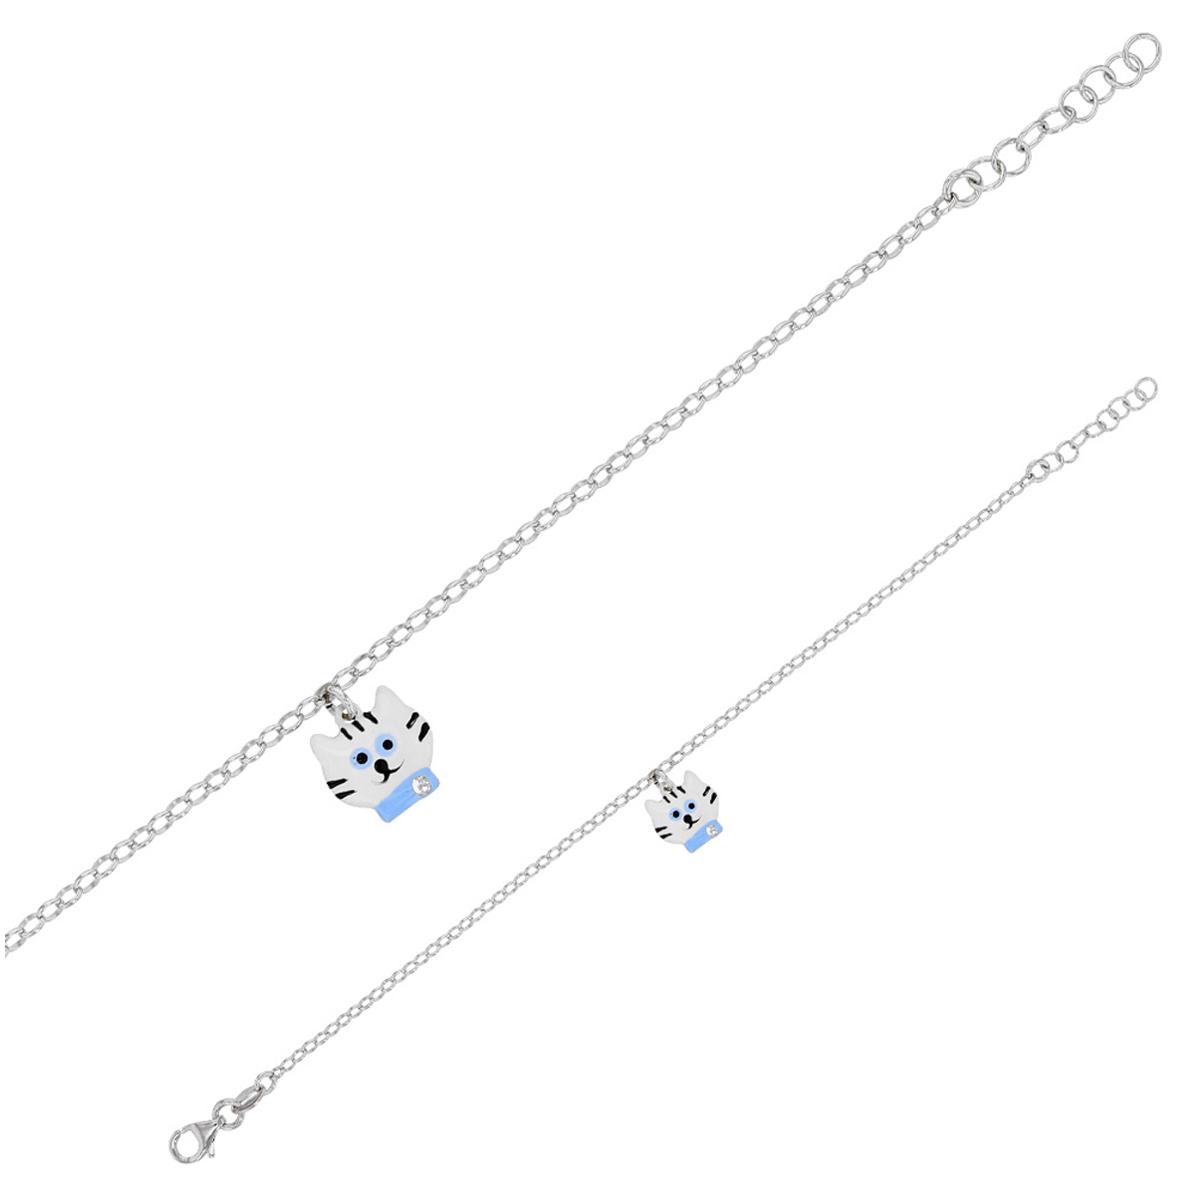 Bracelet Enfant \'Chat\' blanc bleu S&B - 10 mm - [Q6013]